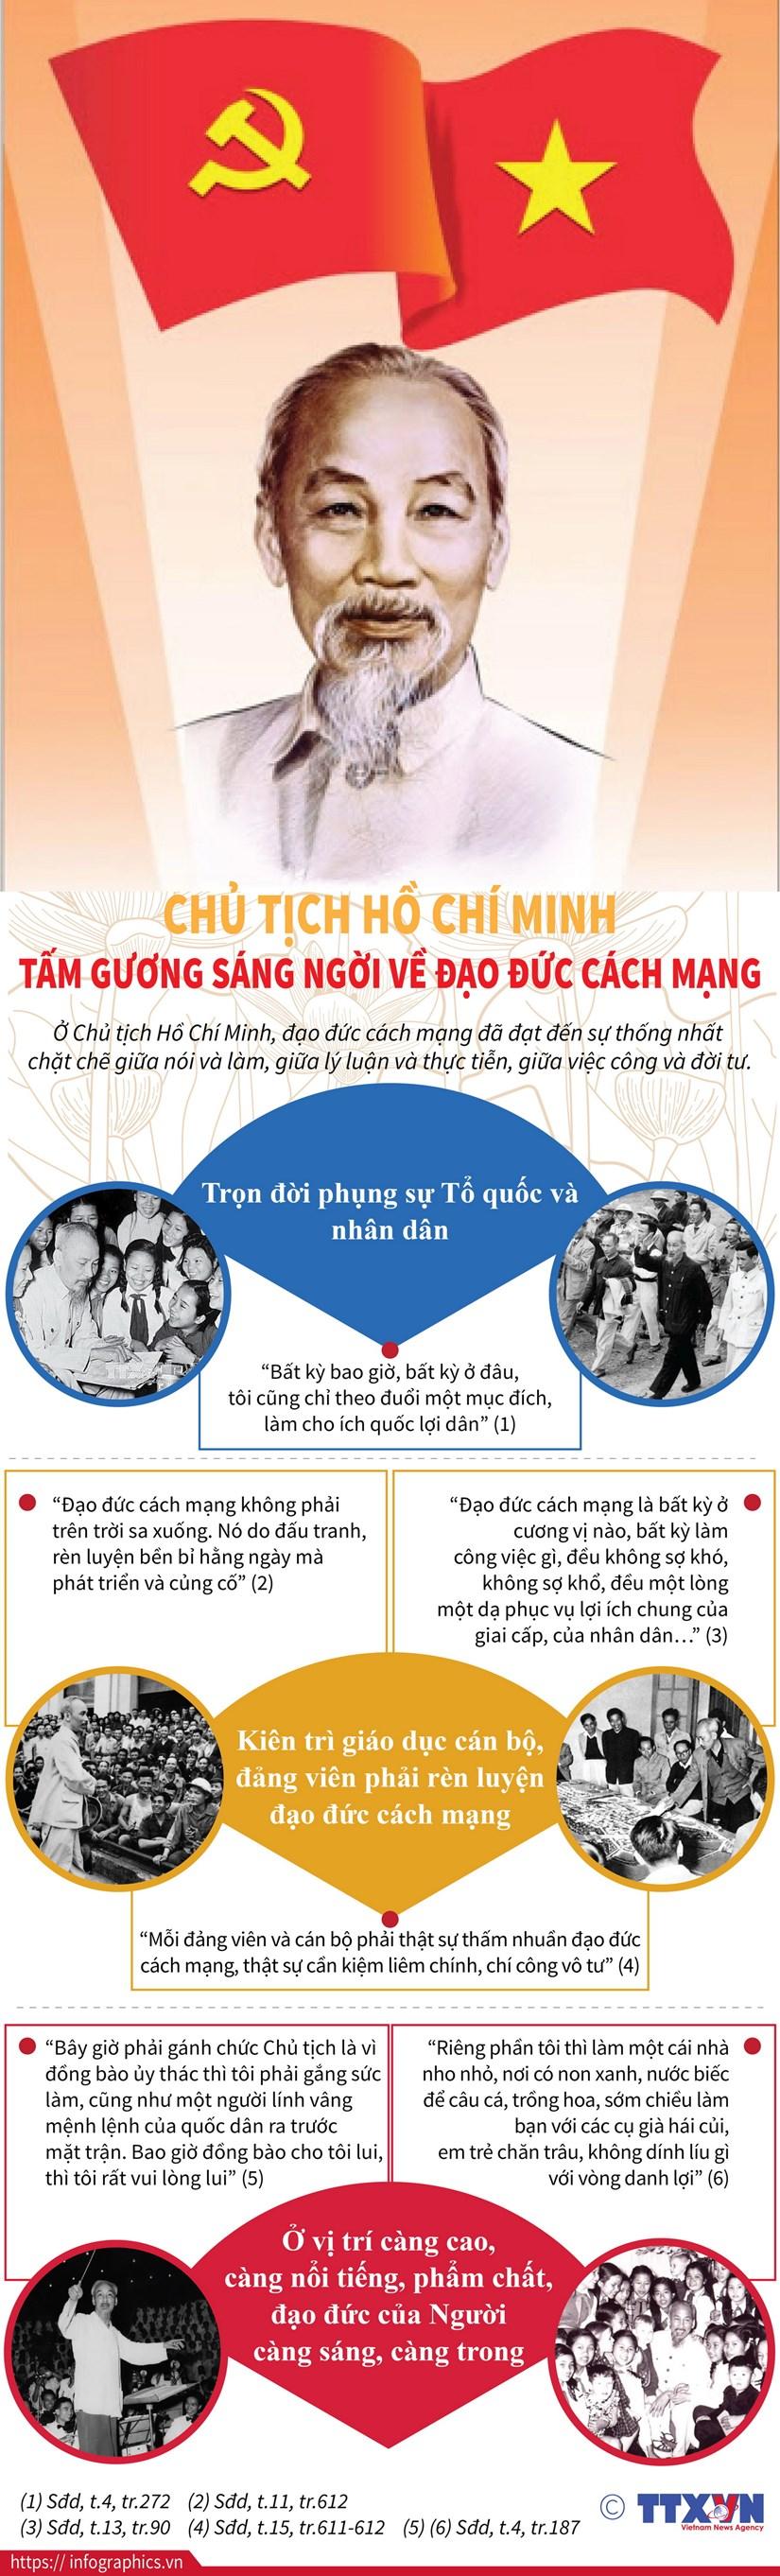 Chu tich Ho Chi Minh - Tam guong sang ngoi ve dao duc cach mang hinh anh 1